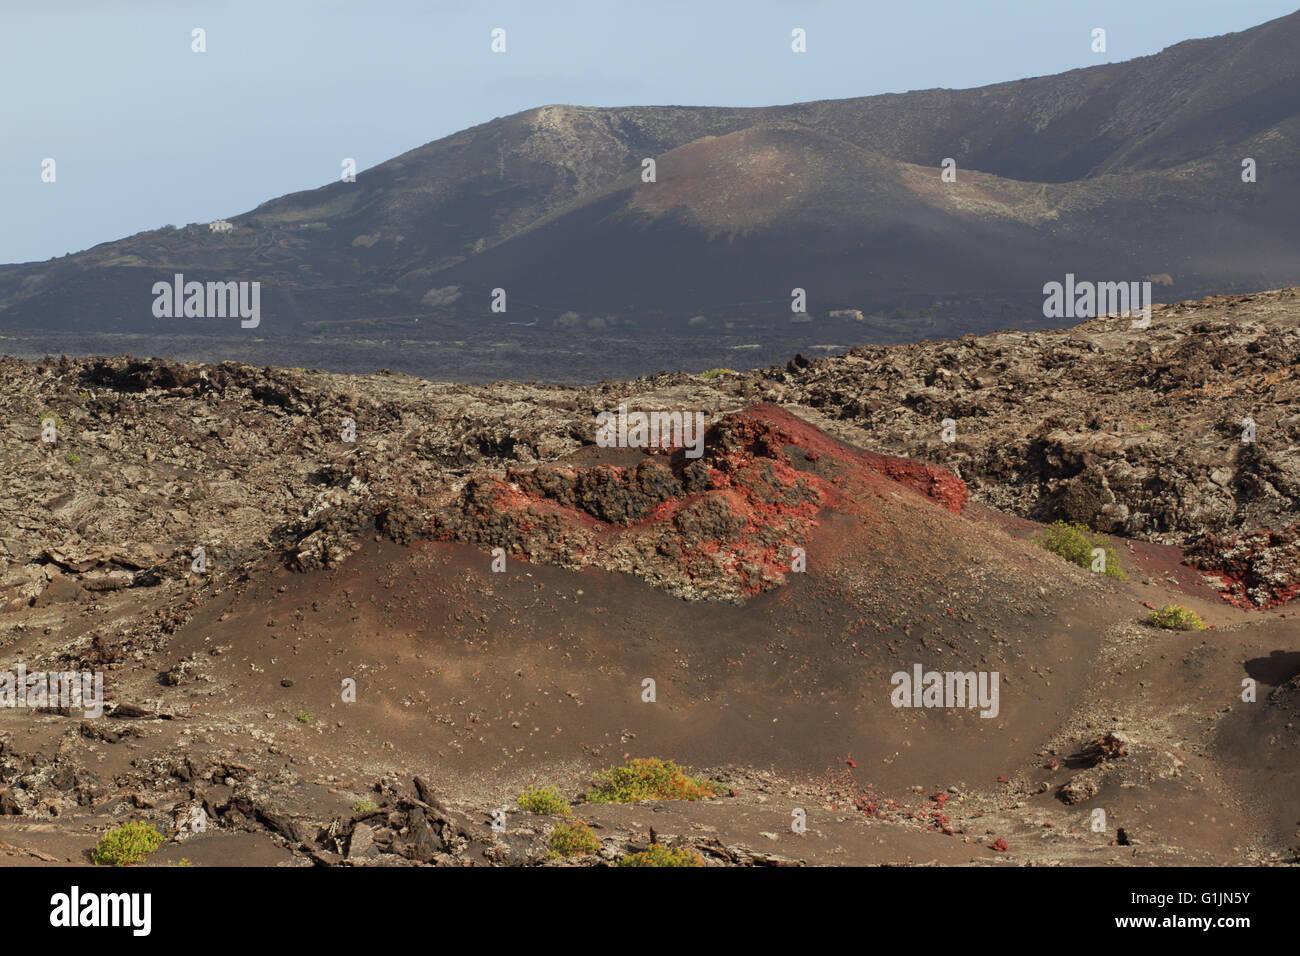 Desert arid peak stone volcanic mars landscape in Lanzarote - Stock Image